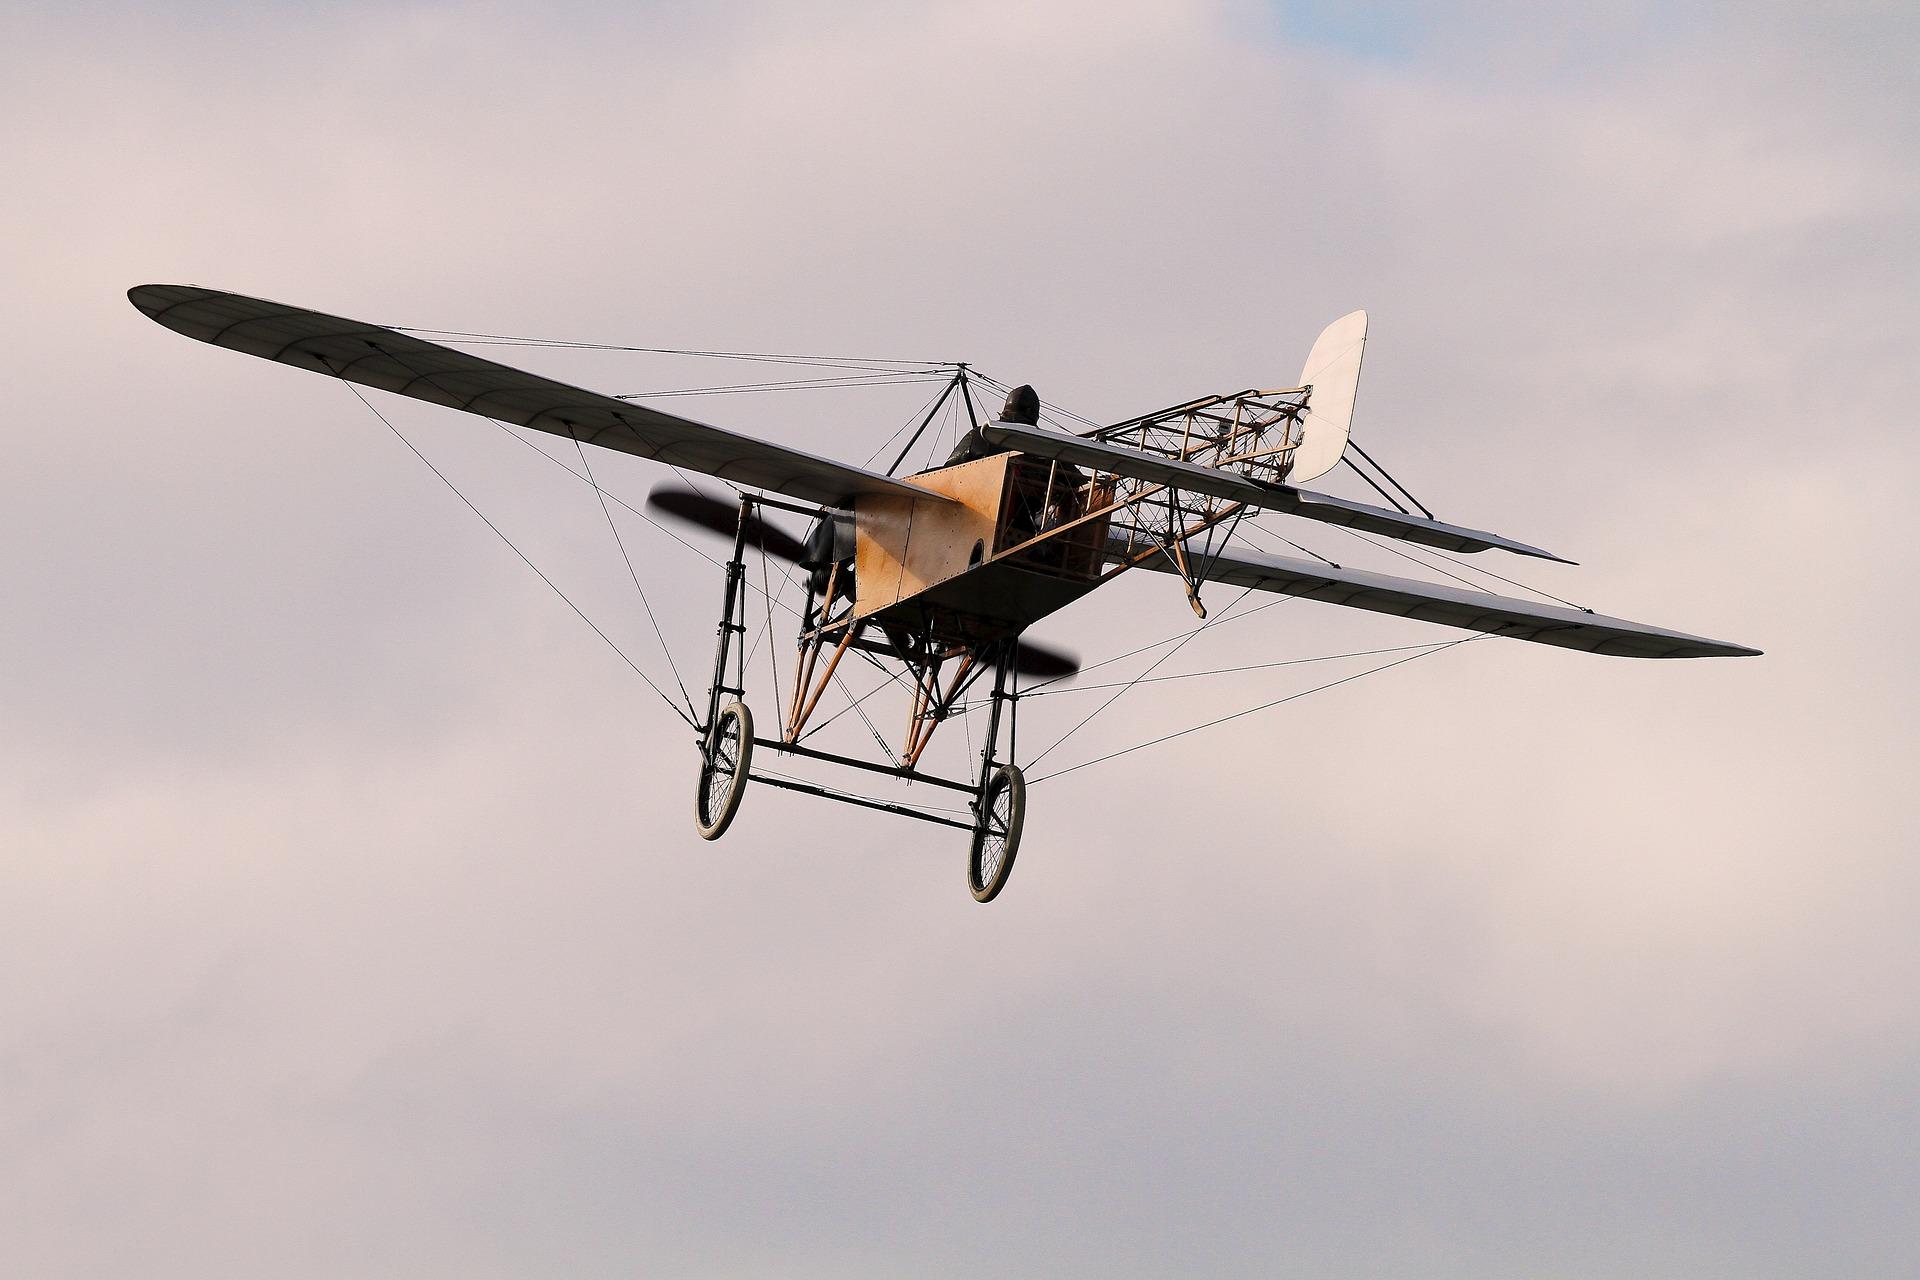 aviation-1686720_1920